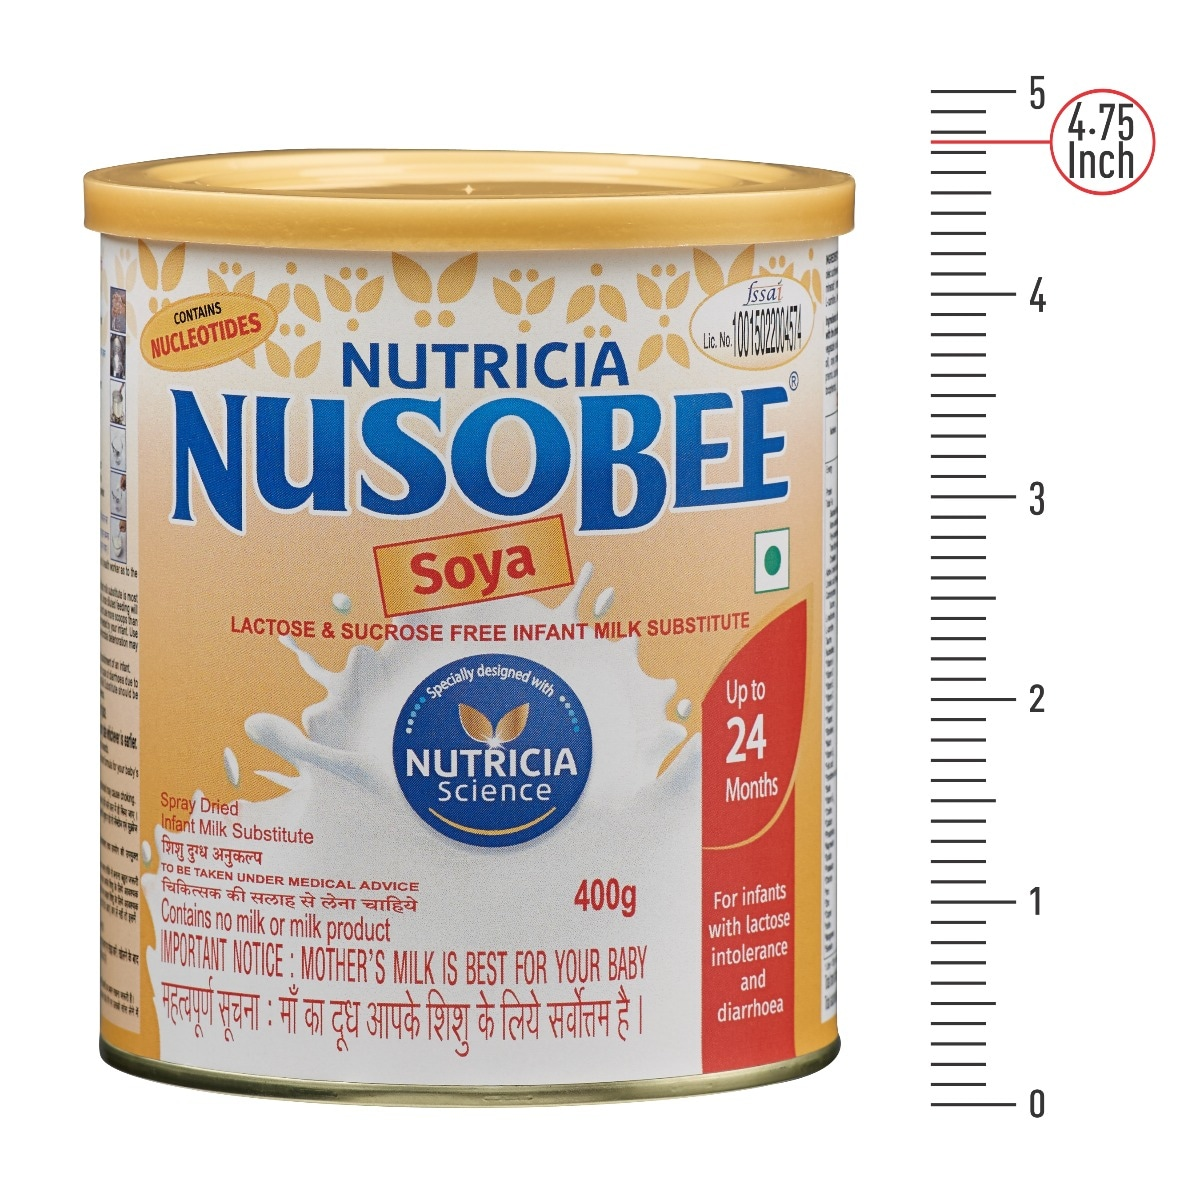 Nutrica Nusobee Soya Infant Formula, 400 gm Tin, Pack of 1